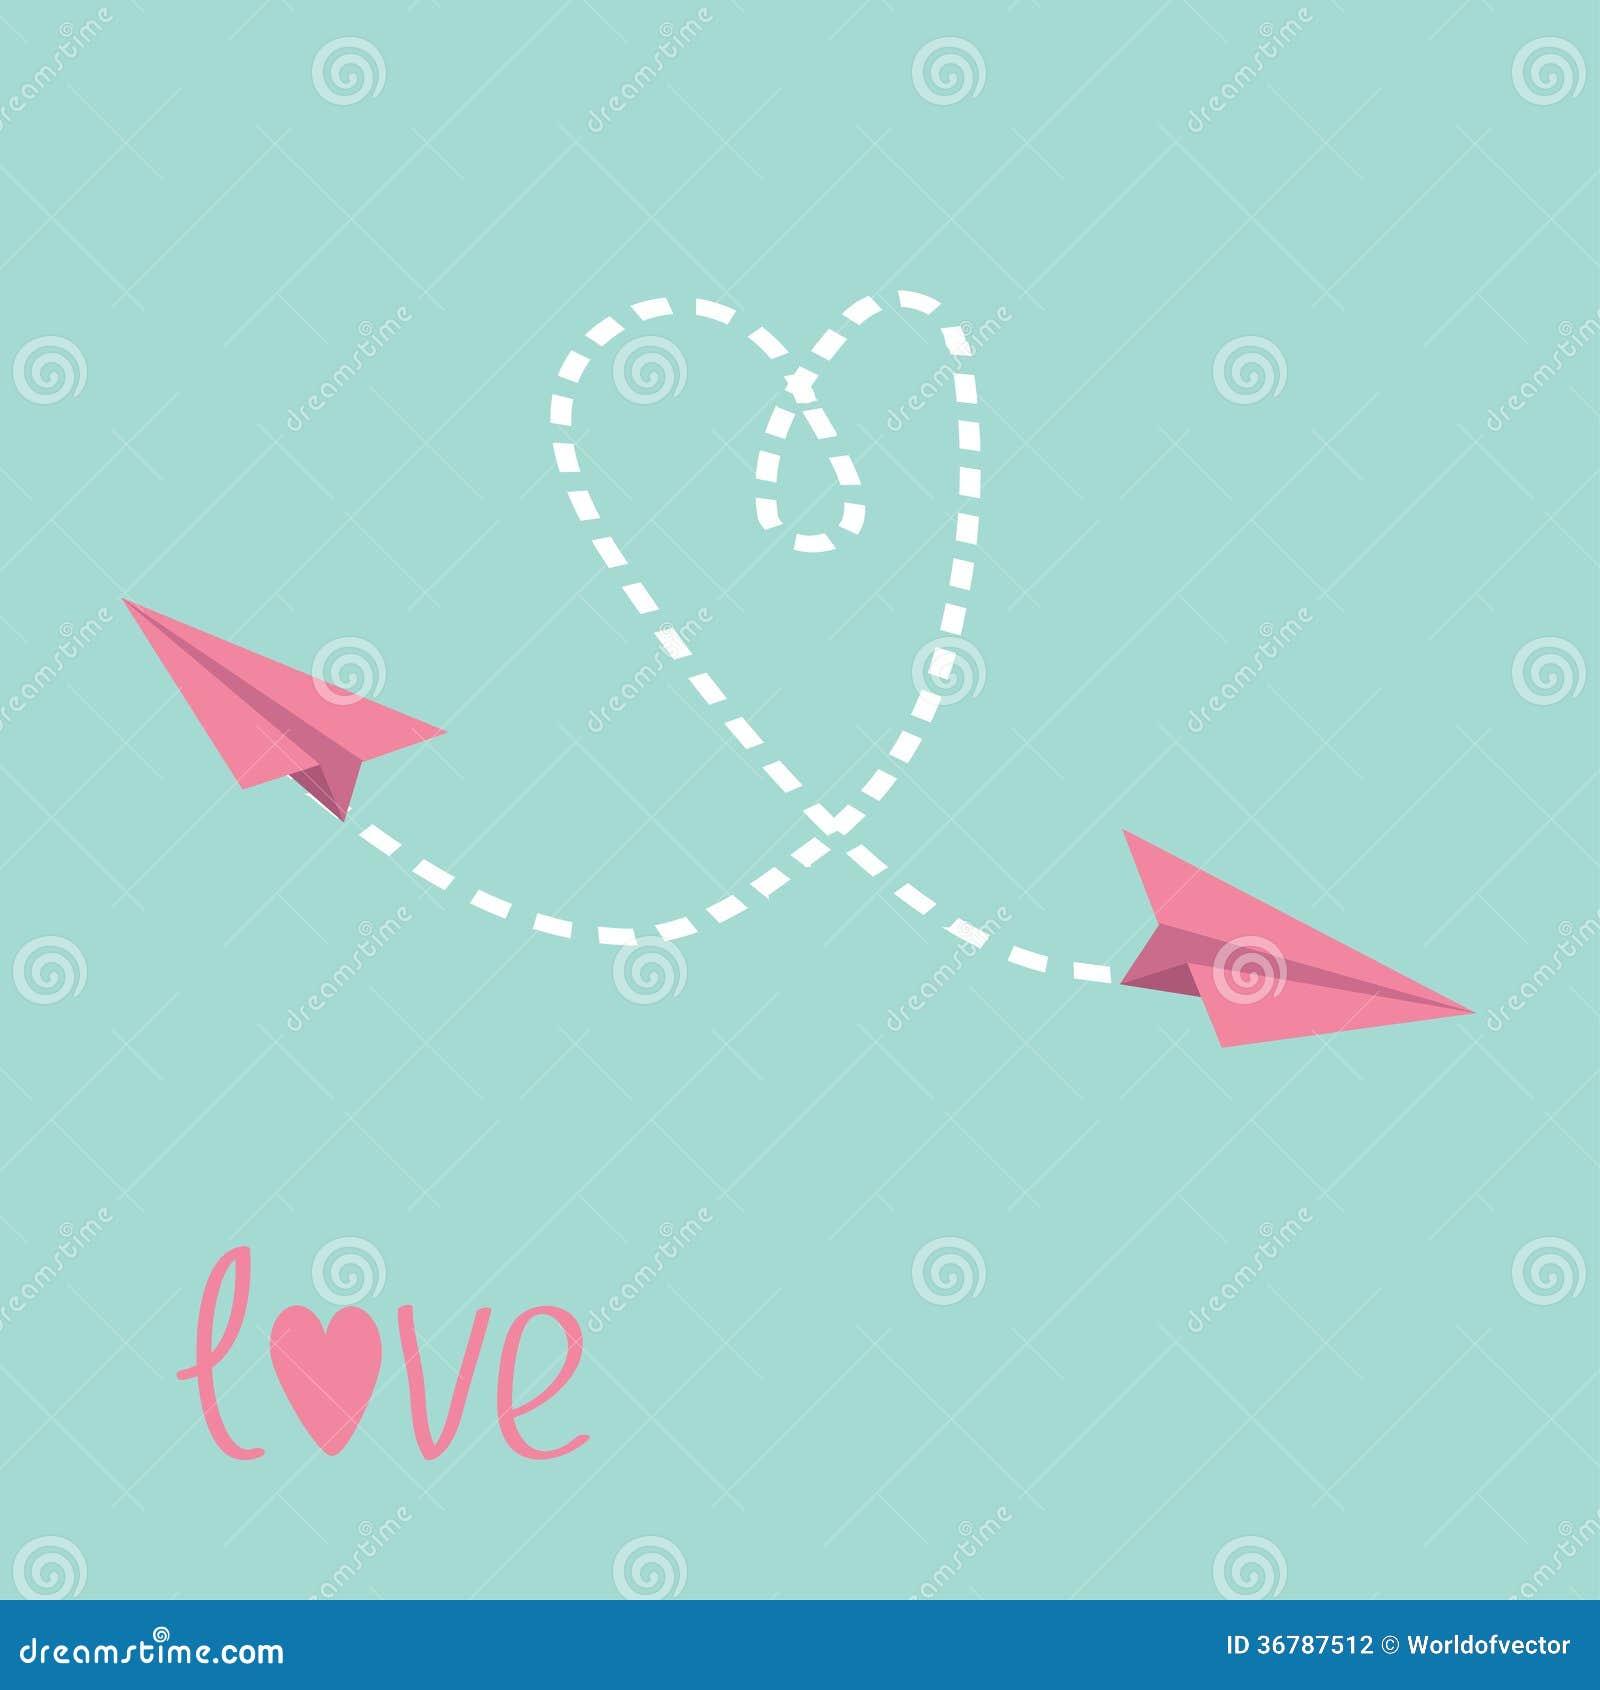 paper plane stock illustration - photo #40